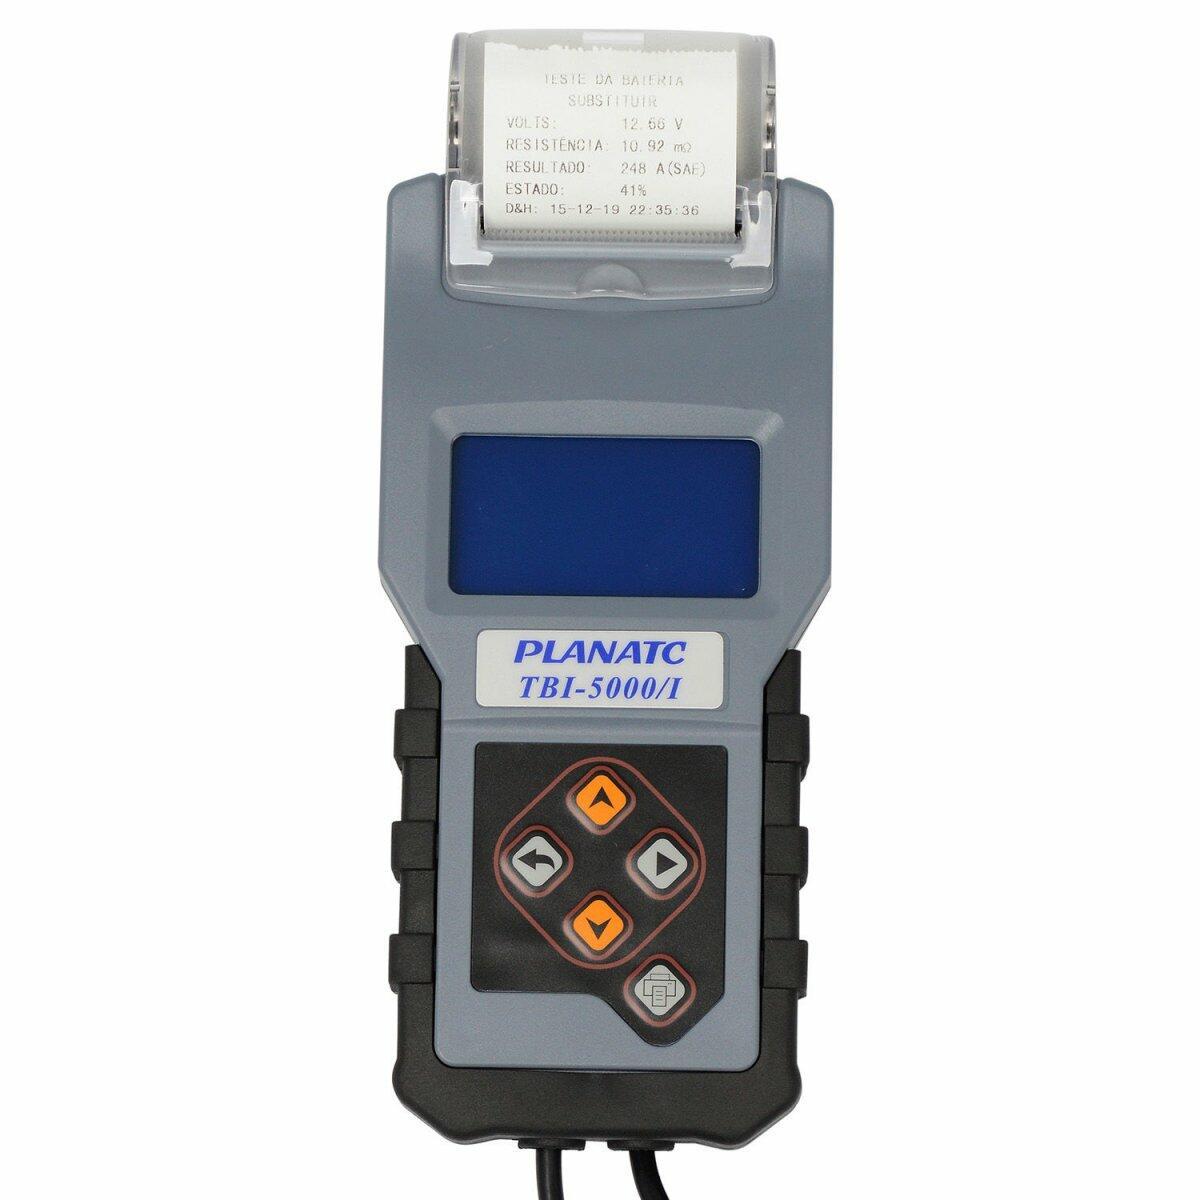 Teste de Bateria Alternador 600A TBI-5000/L Planatc